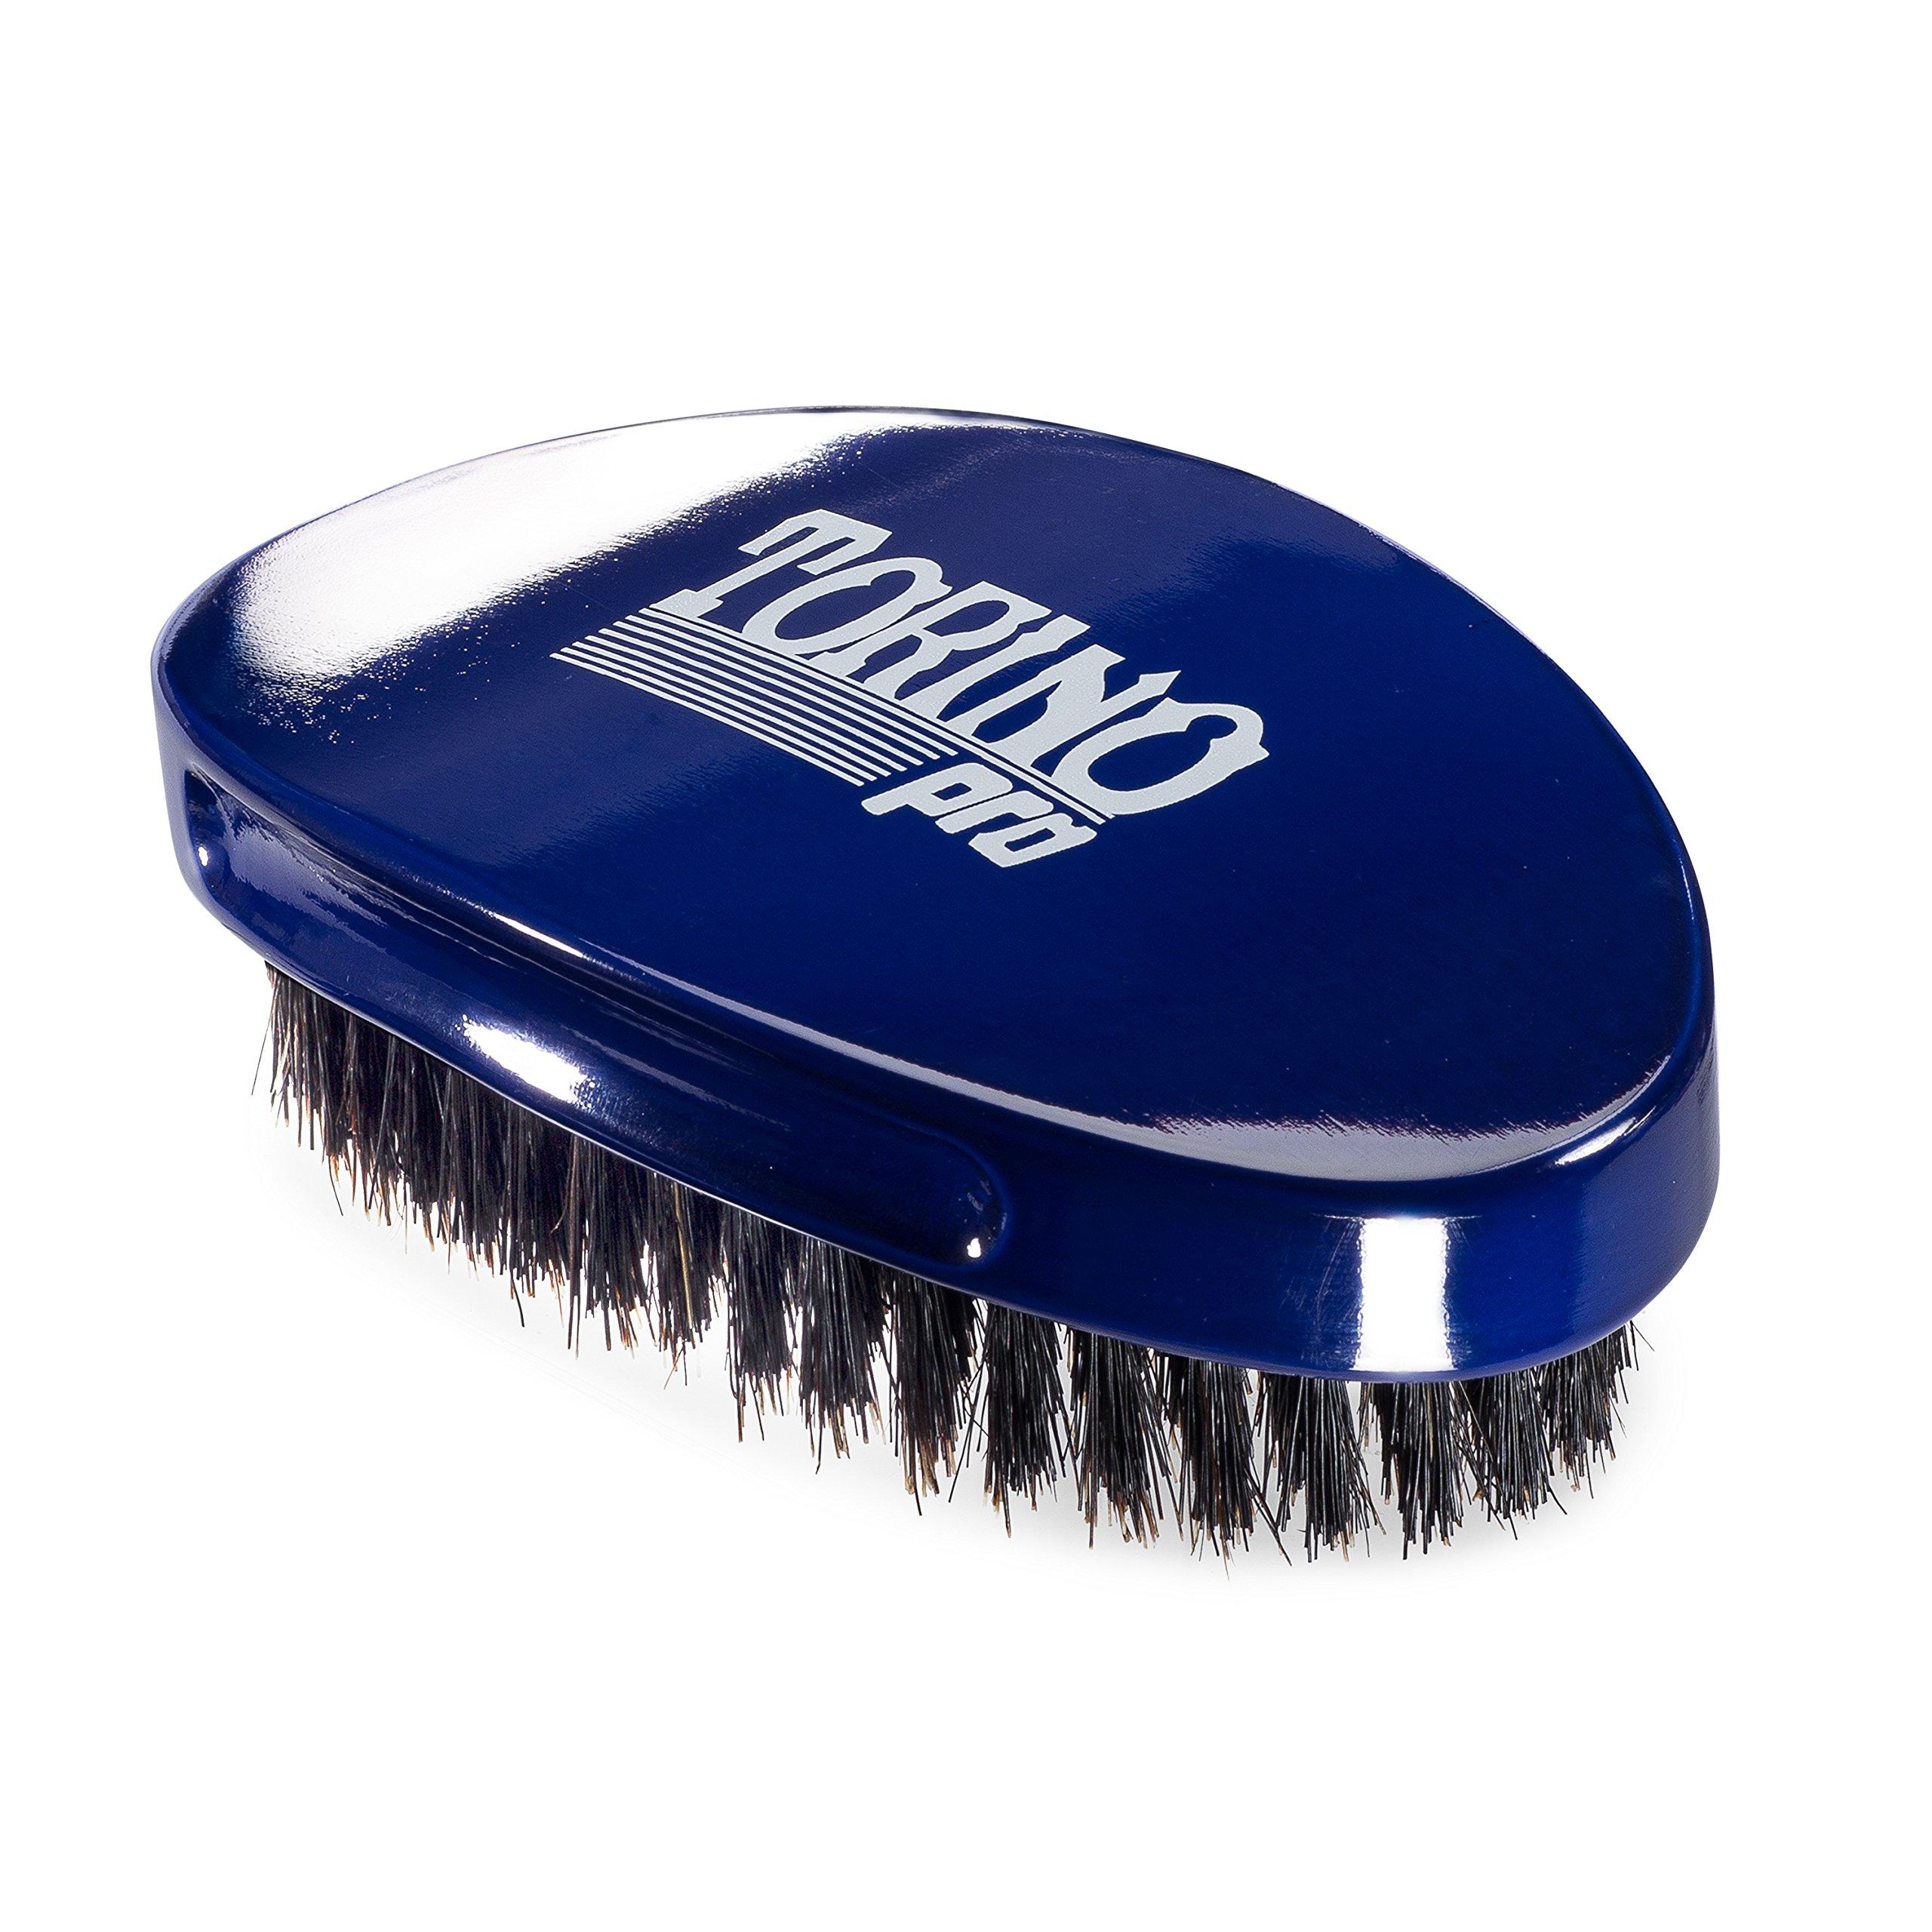 Torino Pro Wave Brush #680 By Brush King - Medium Curve 360 Waves Palm Brush